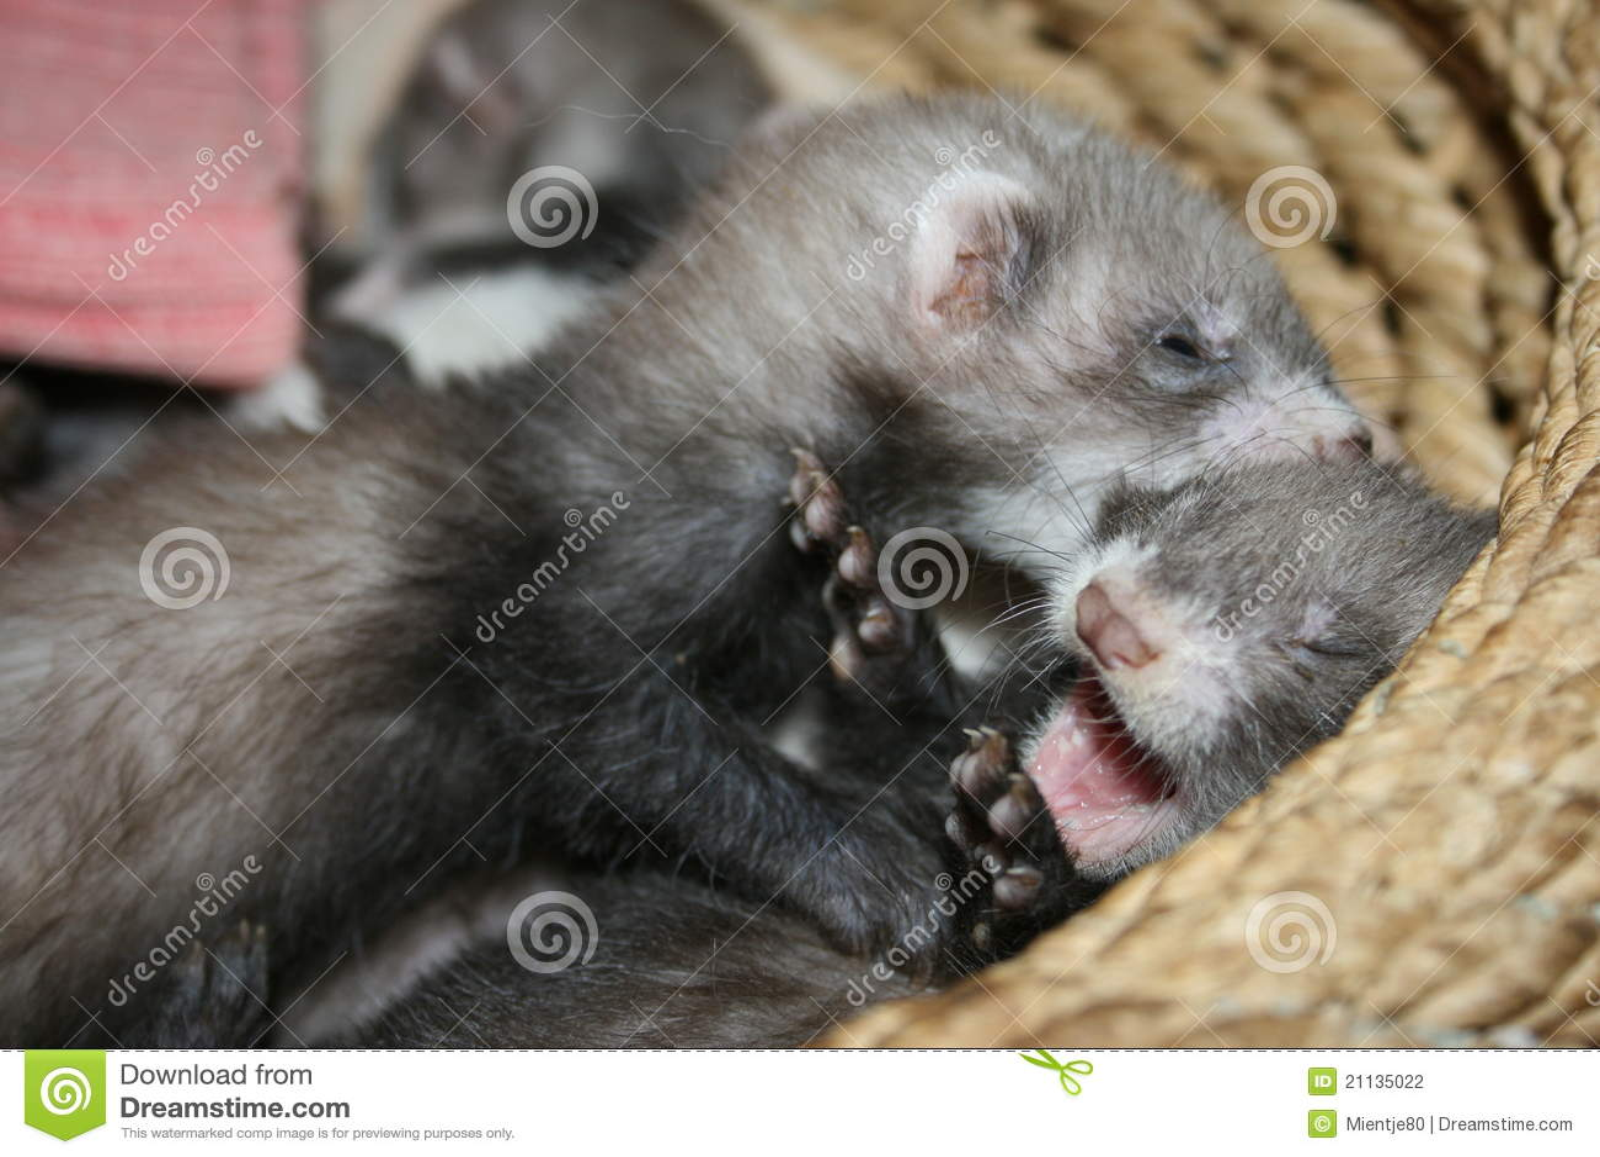 steroid ferret poodle